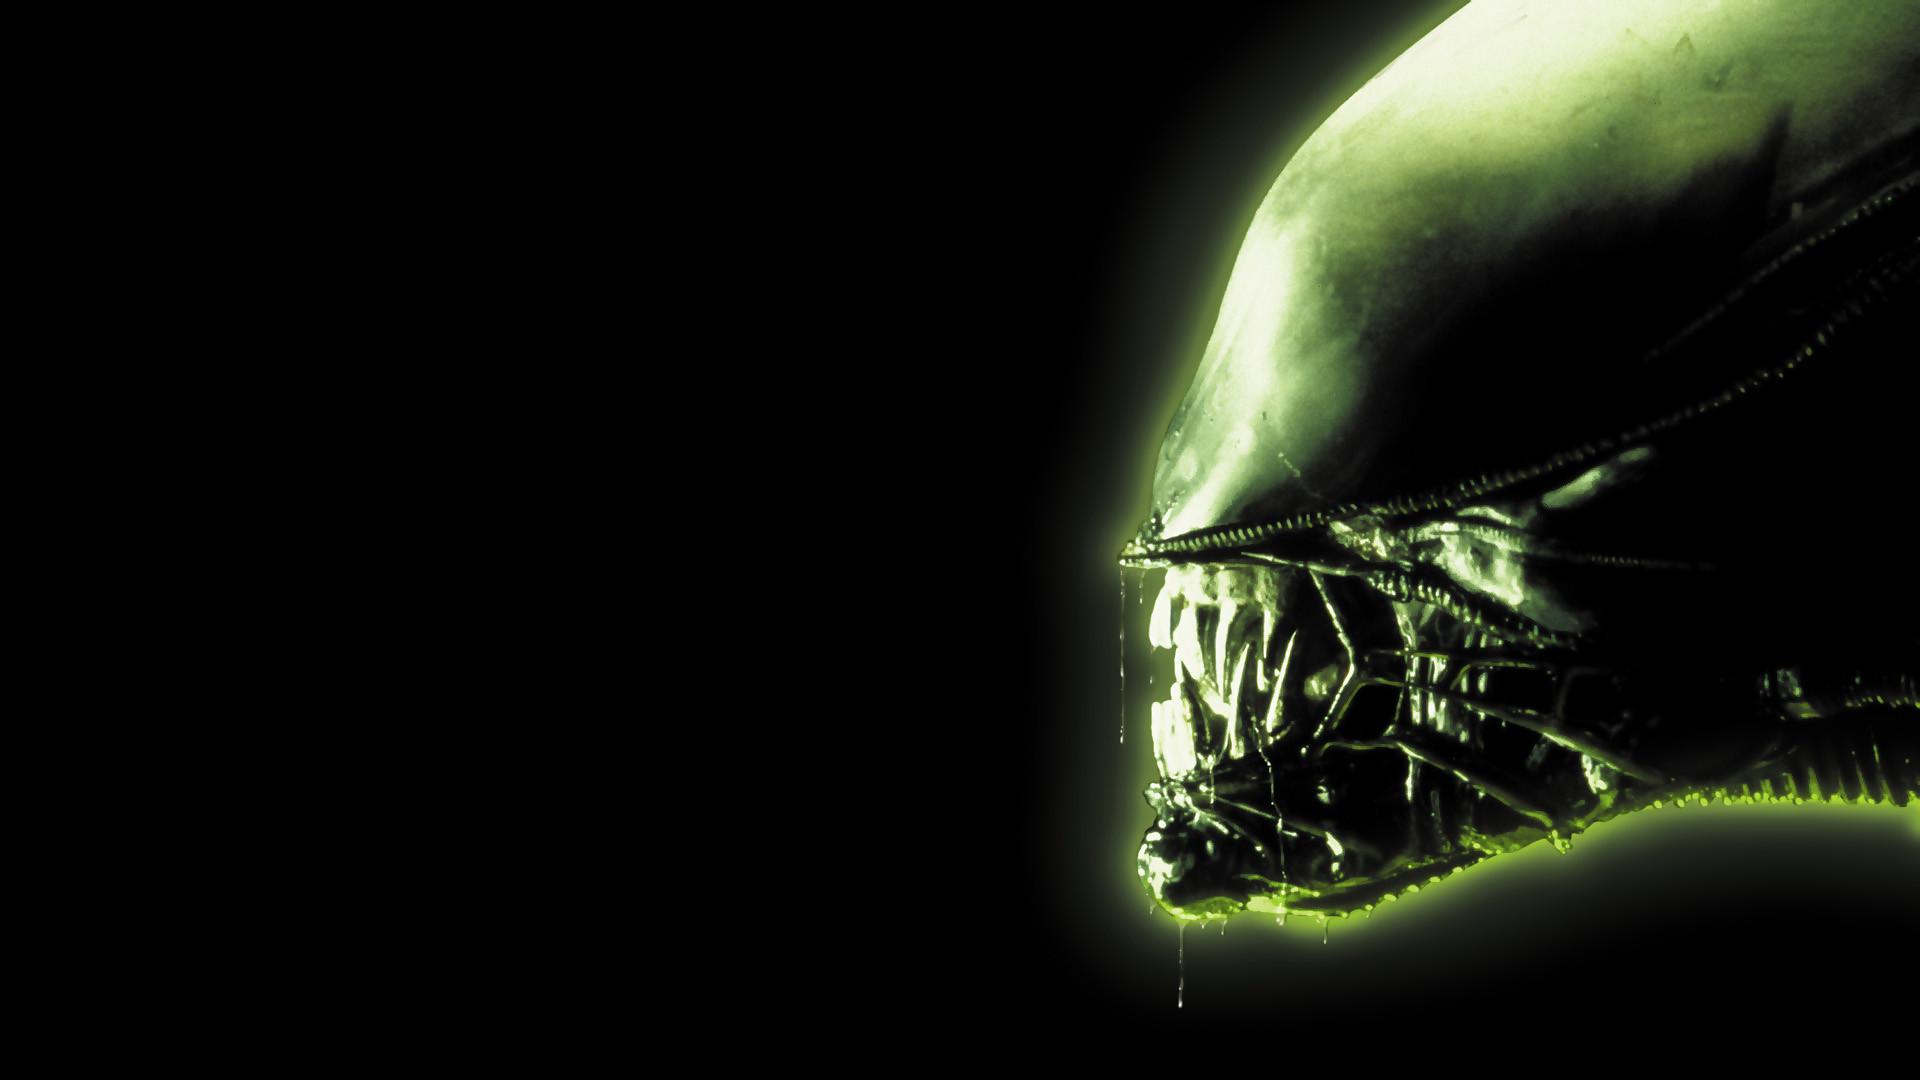 Download Fullsize Image · Cool Space Wallpapers 6873953-alien-wallpaper